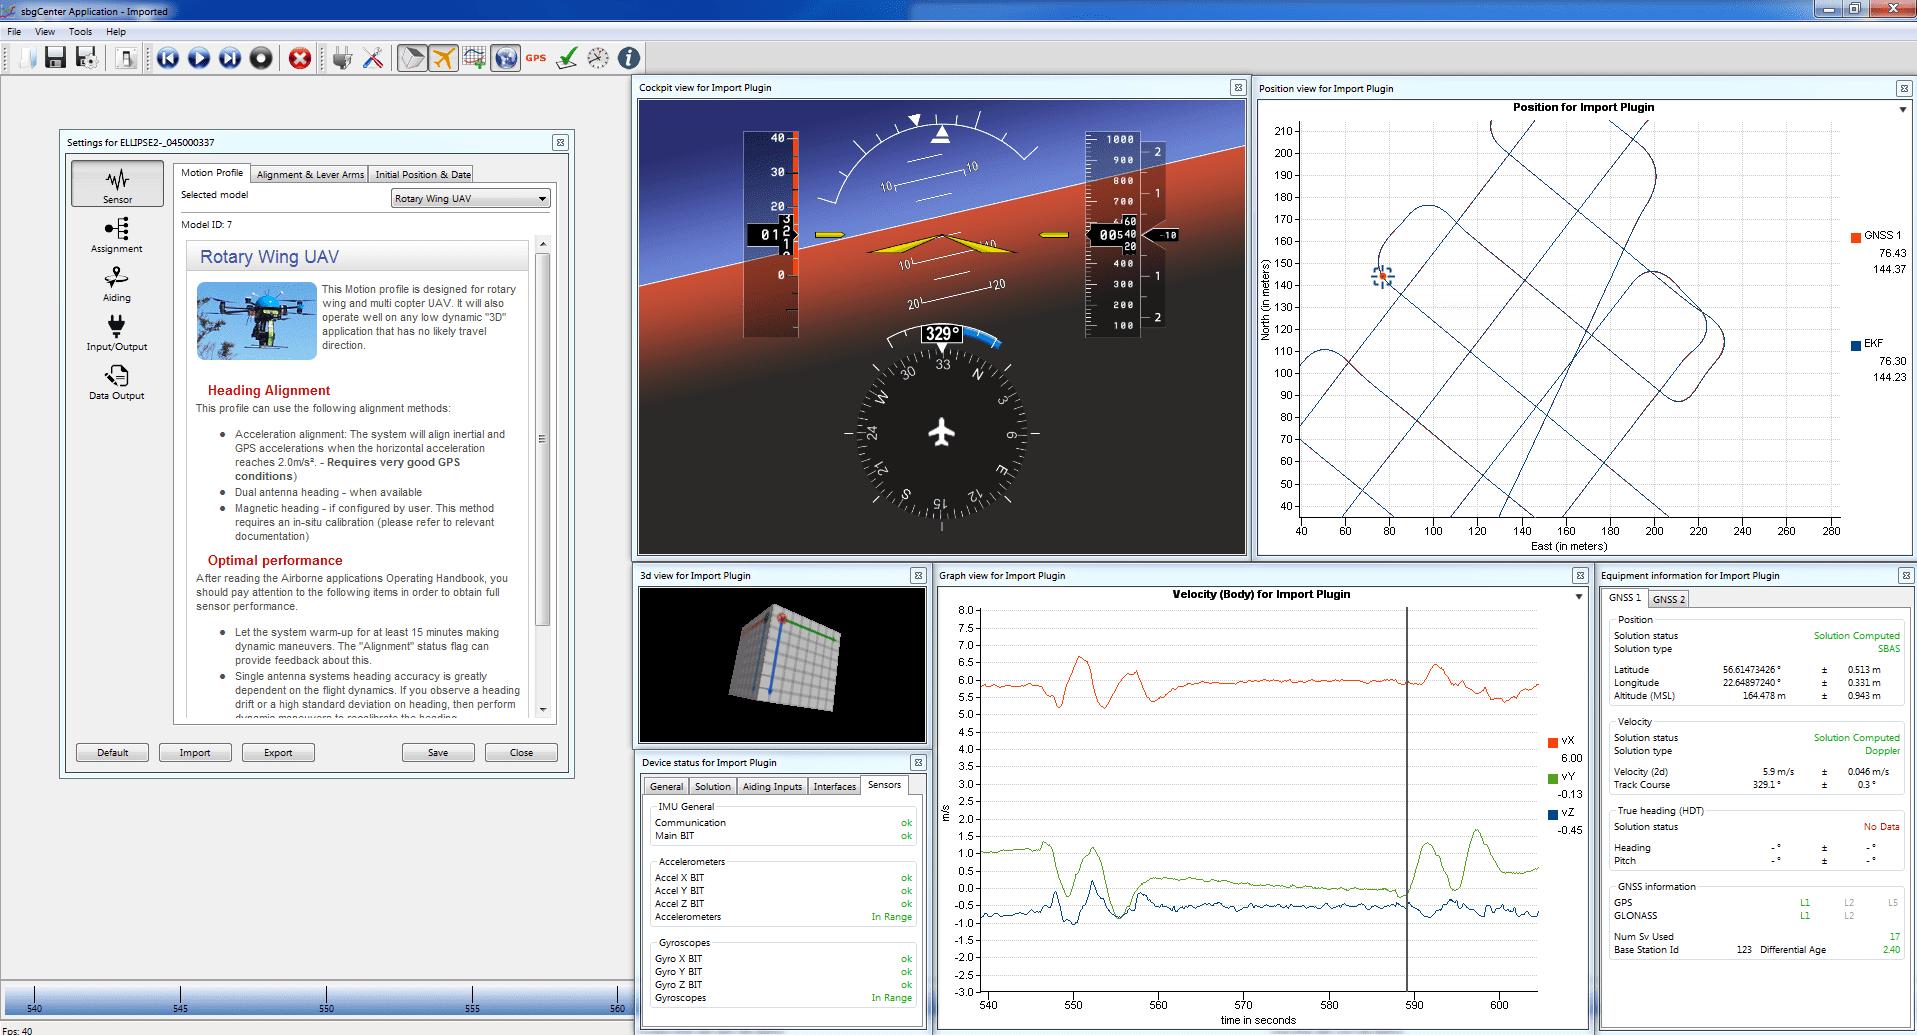 Development Kit - SBG Systems